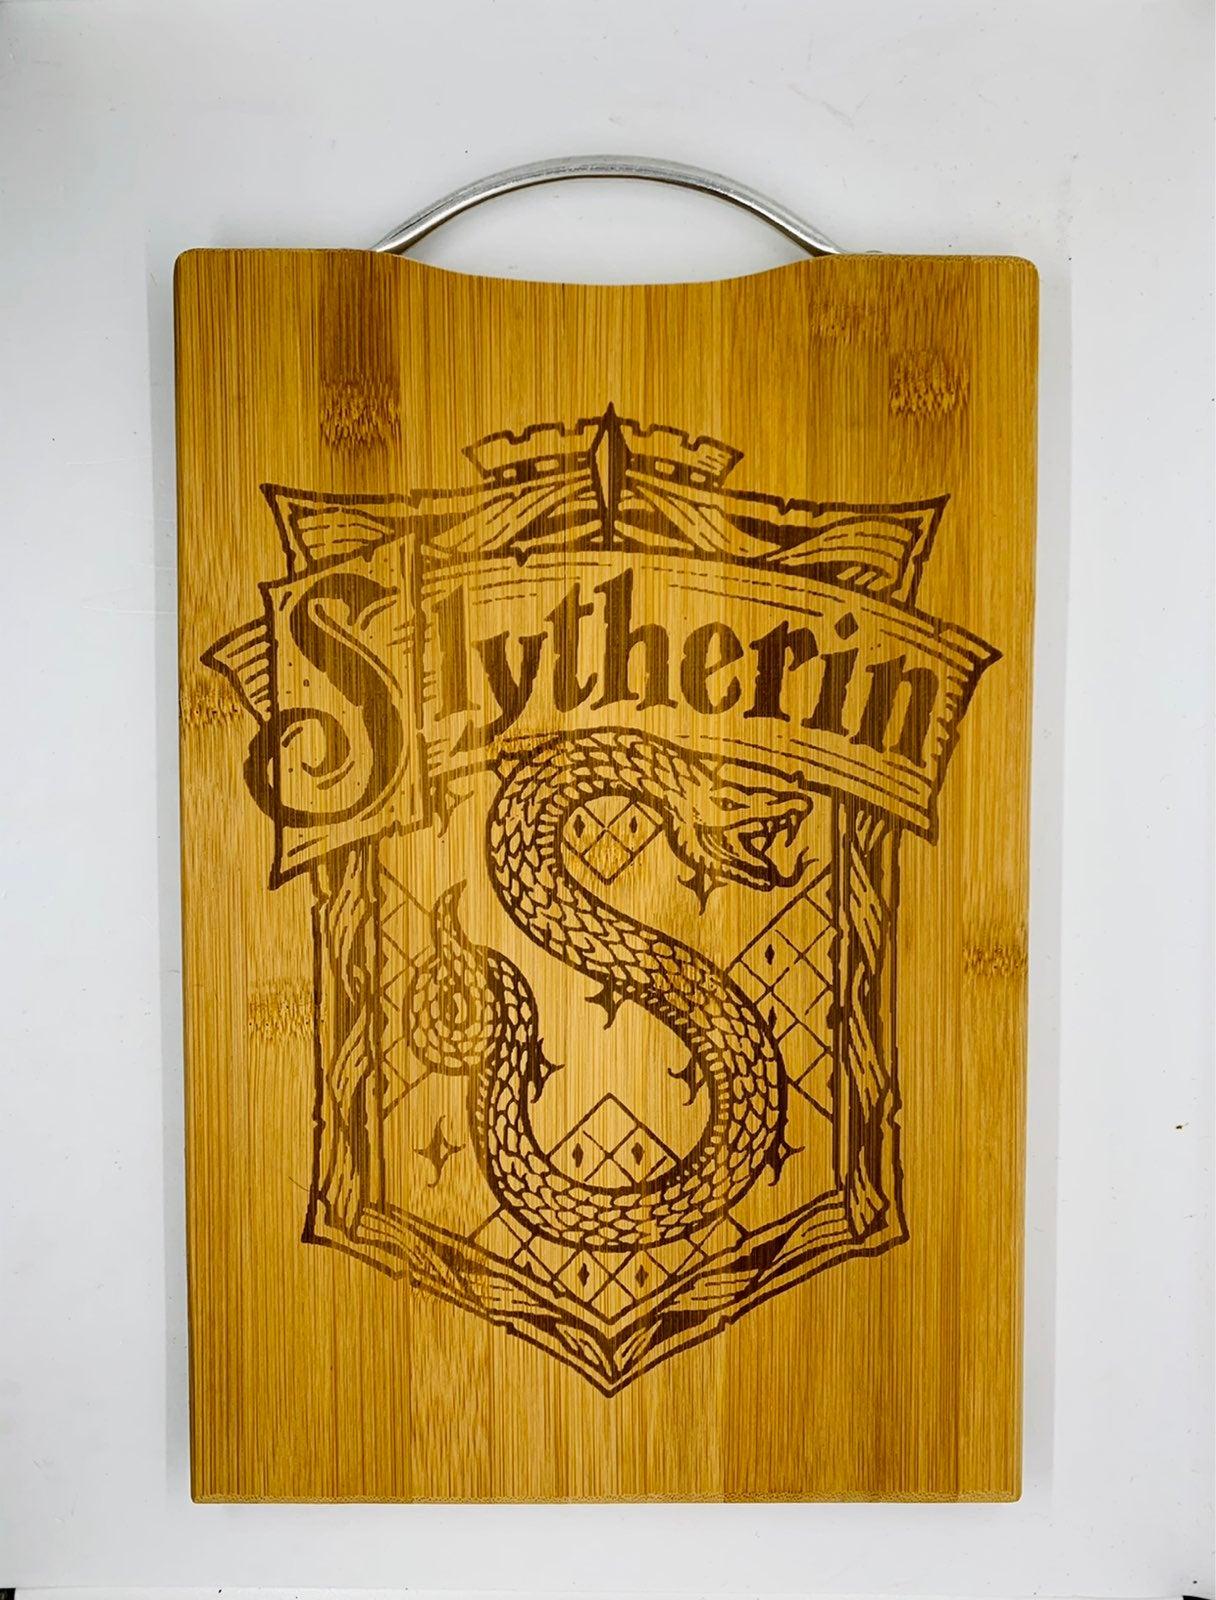 Harry potter Slytherin engraved board